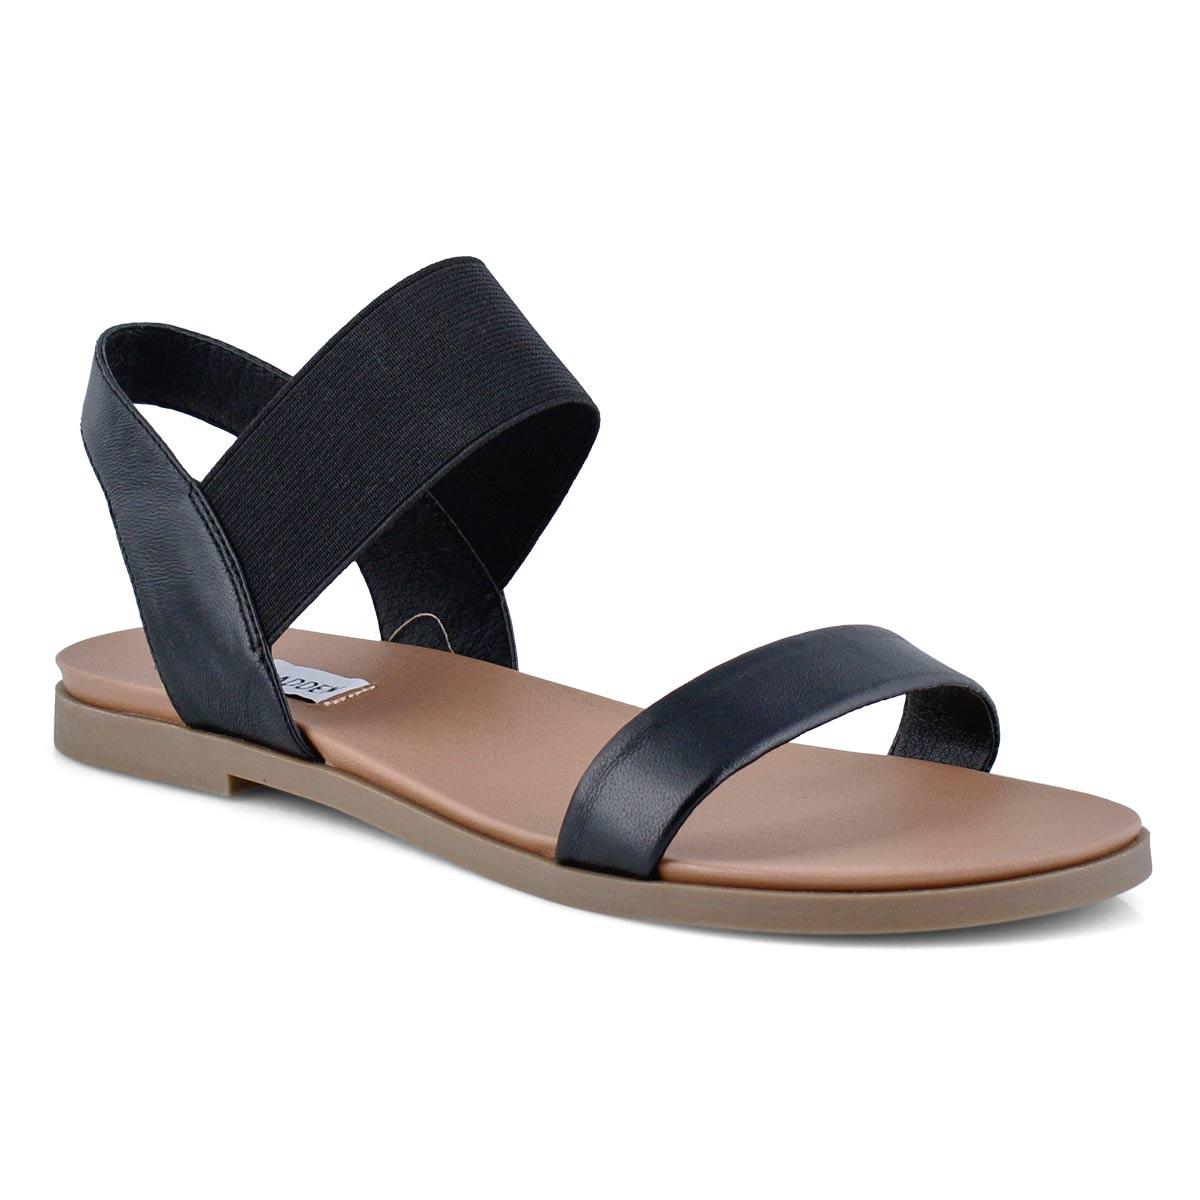 Lds Darnell black casual sandal